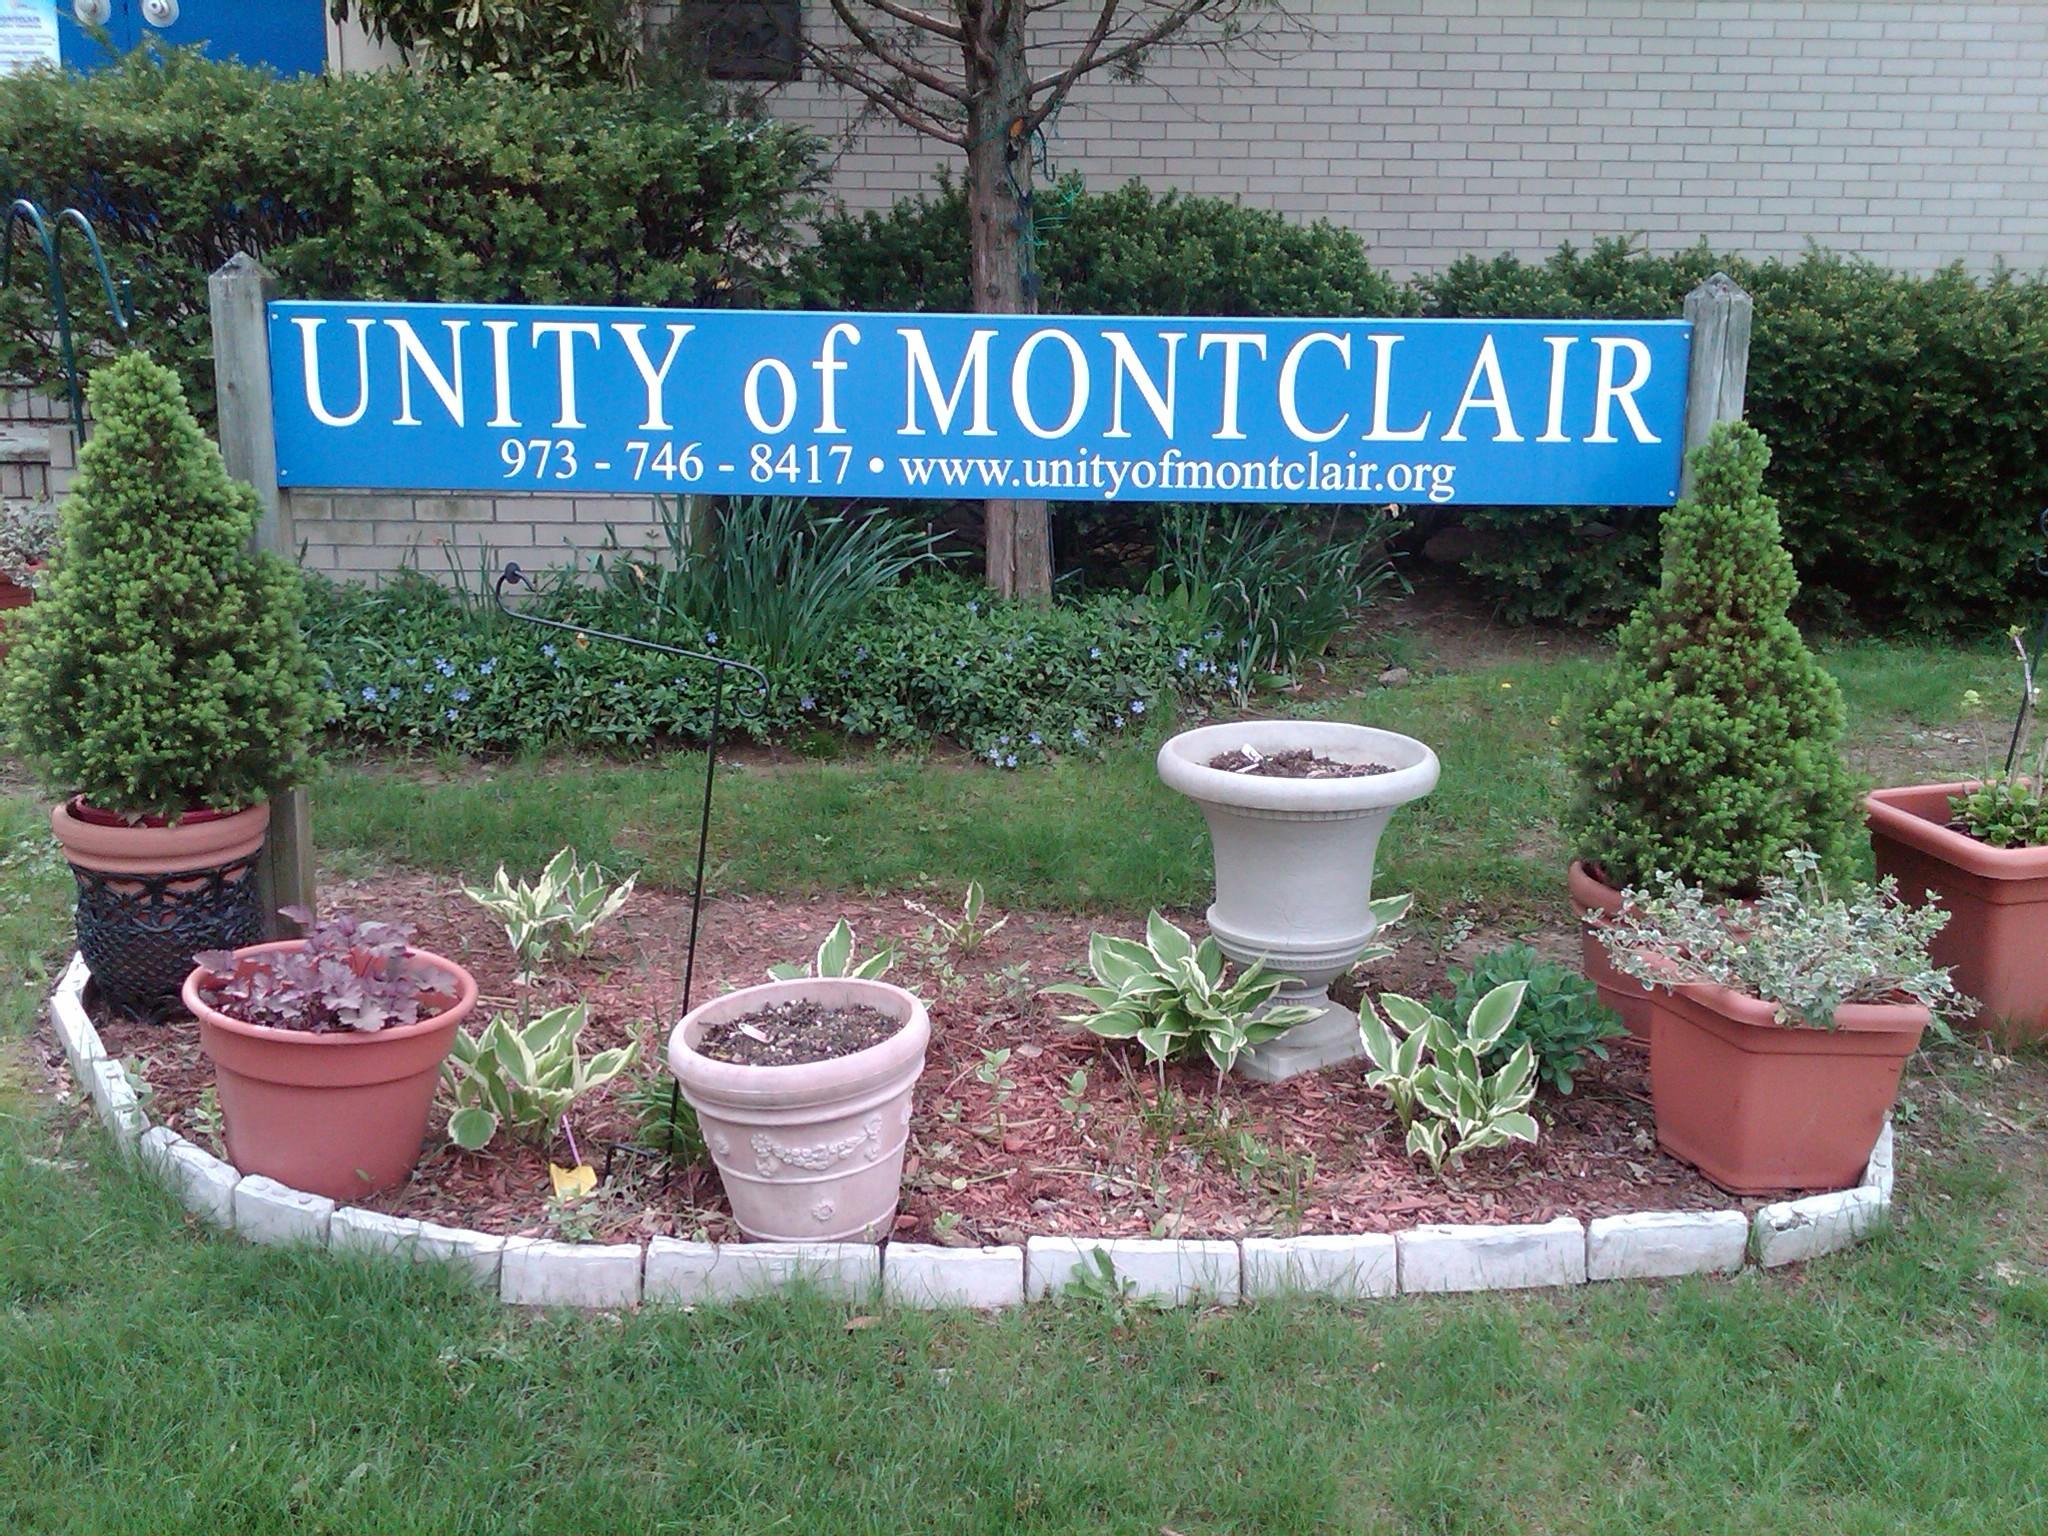 7382d18f0c95c180d69a_2011-04-24_unity_of_montclair_sign_img00052-20110501-1523.jpg